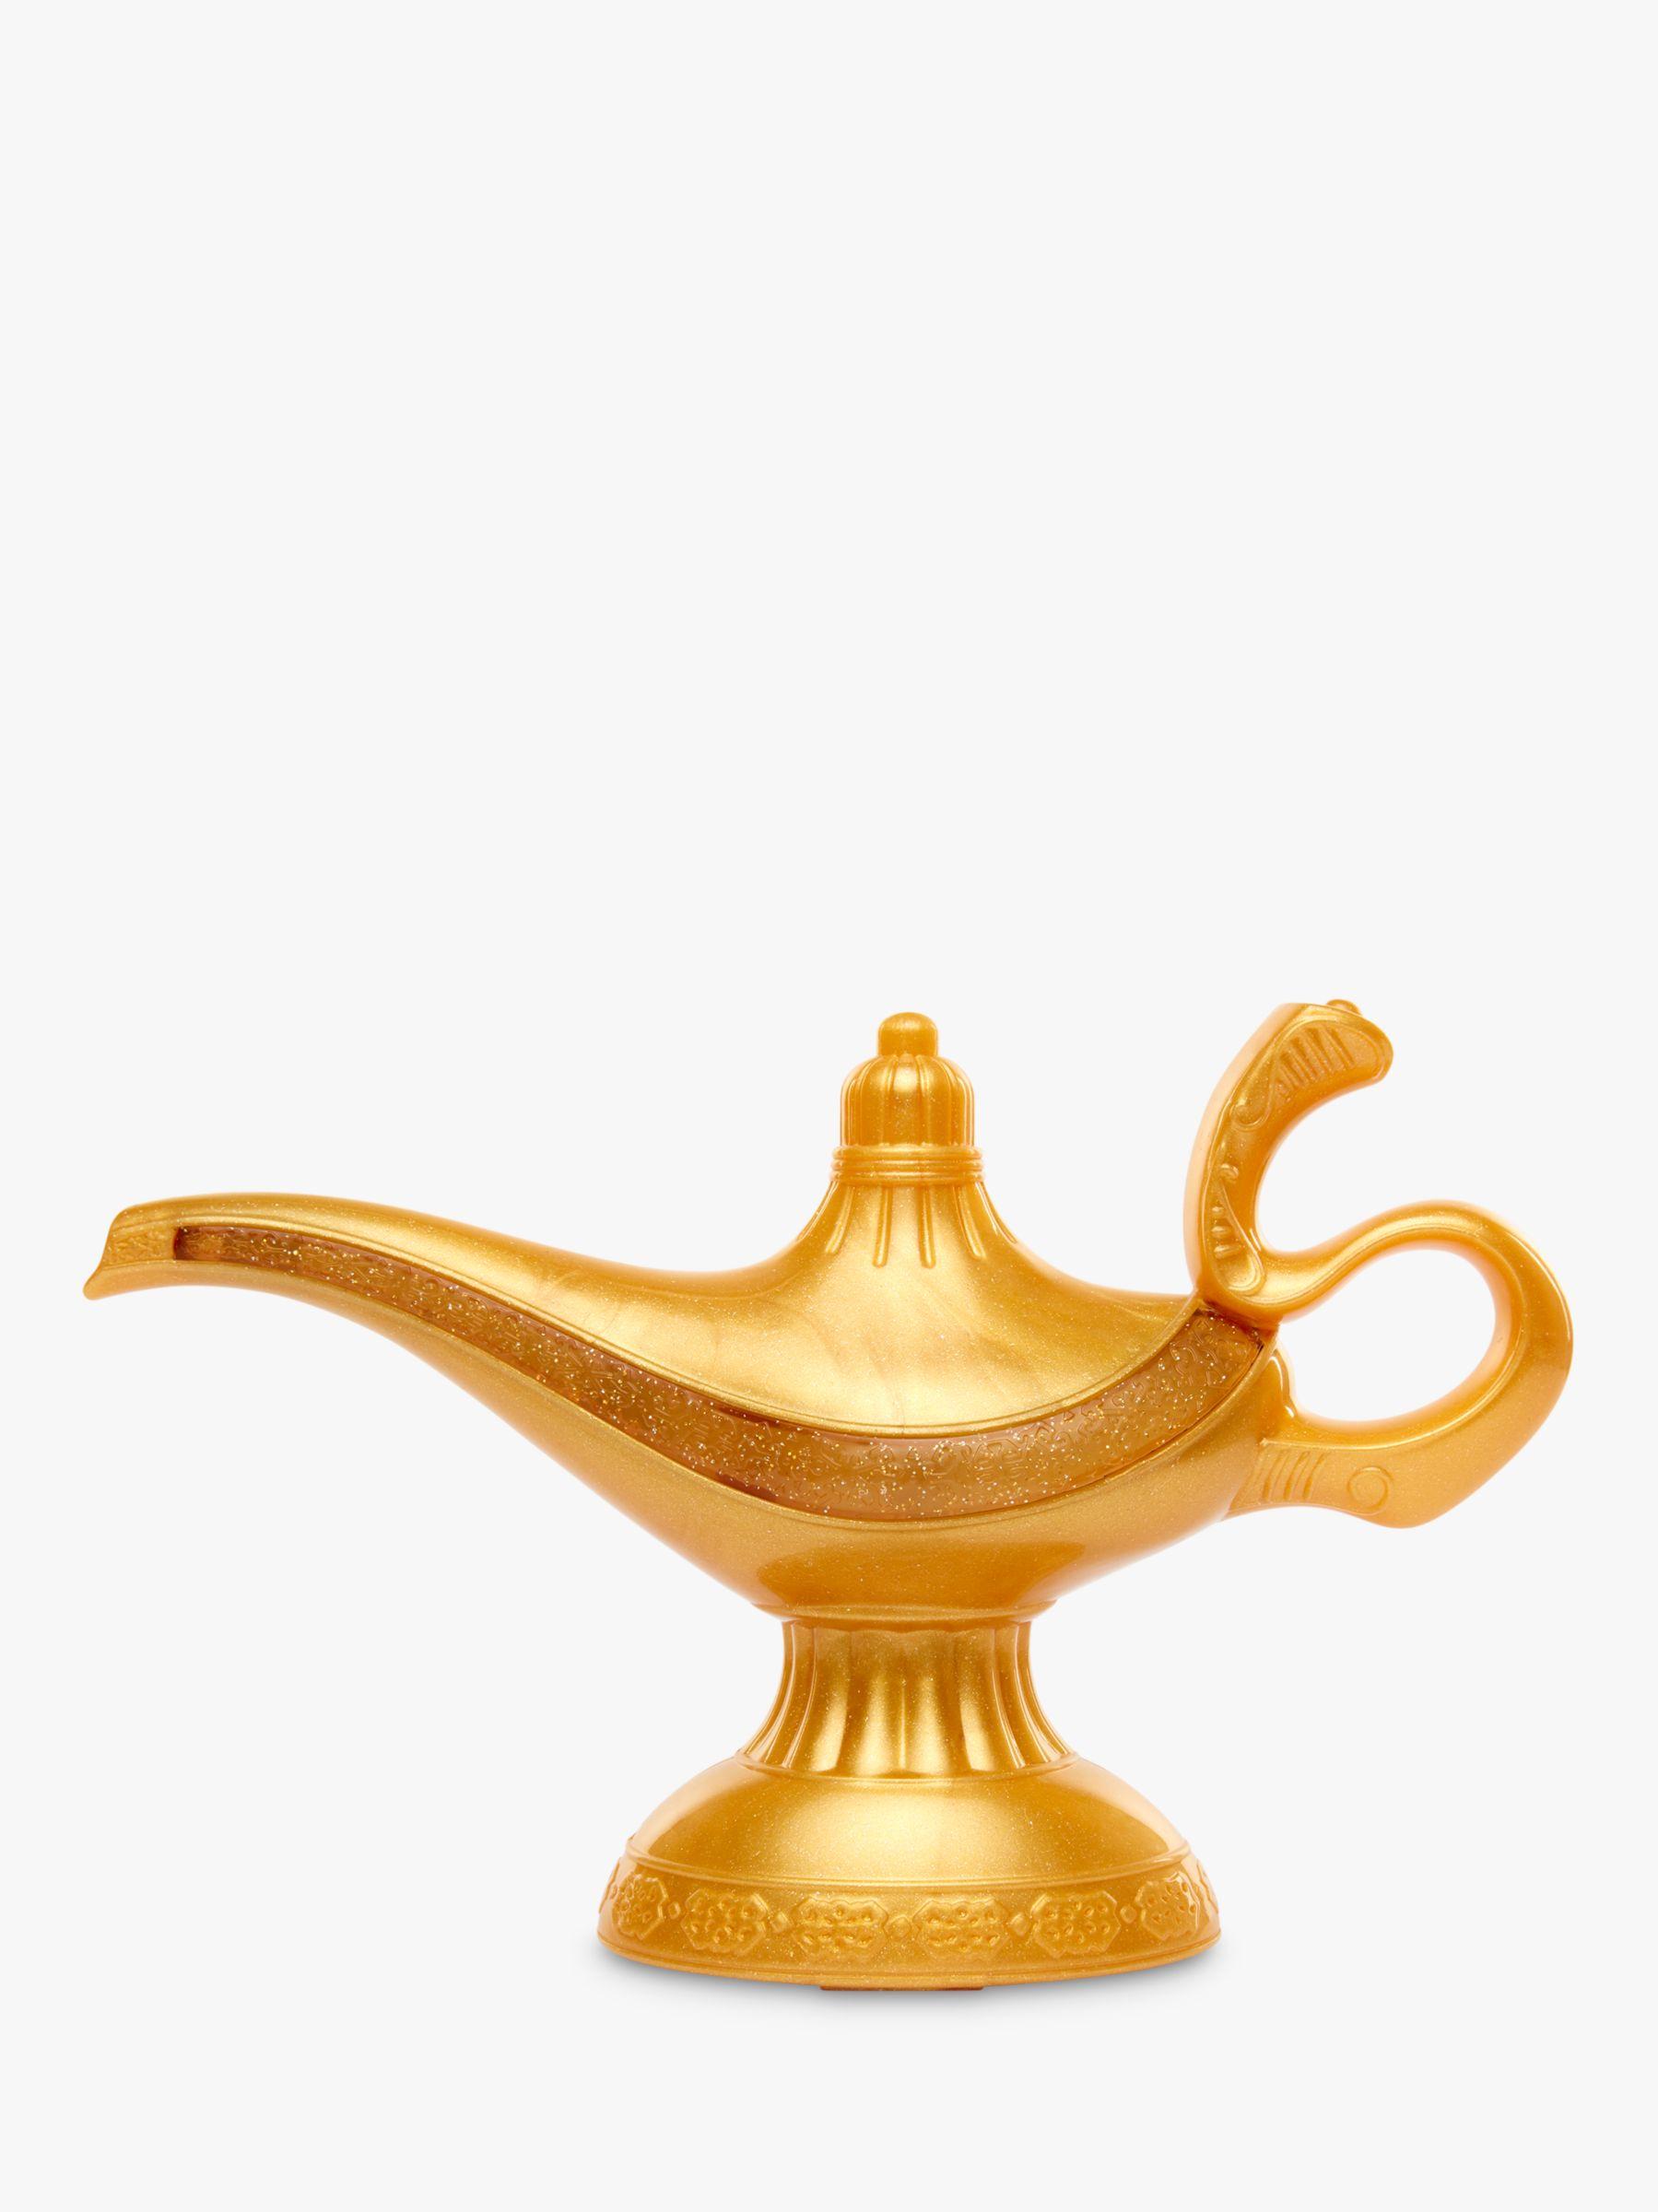 Aladdin Disney's Aladdin Genie Lamp